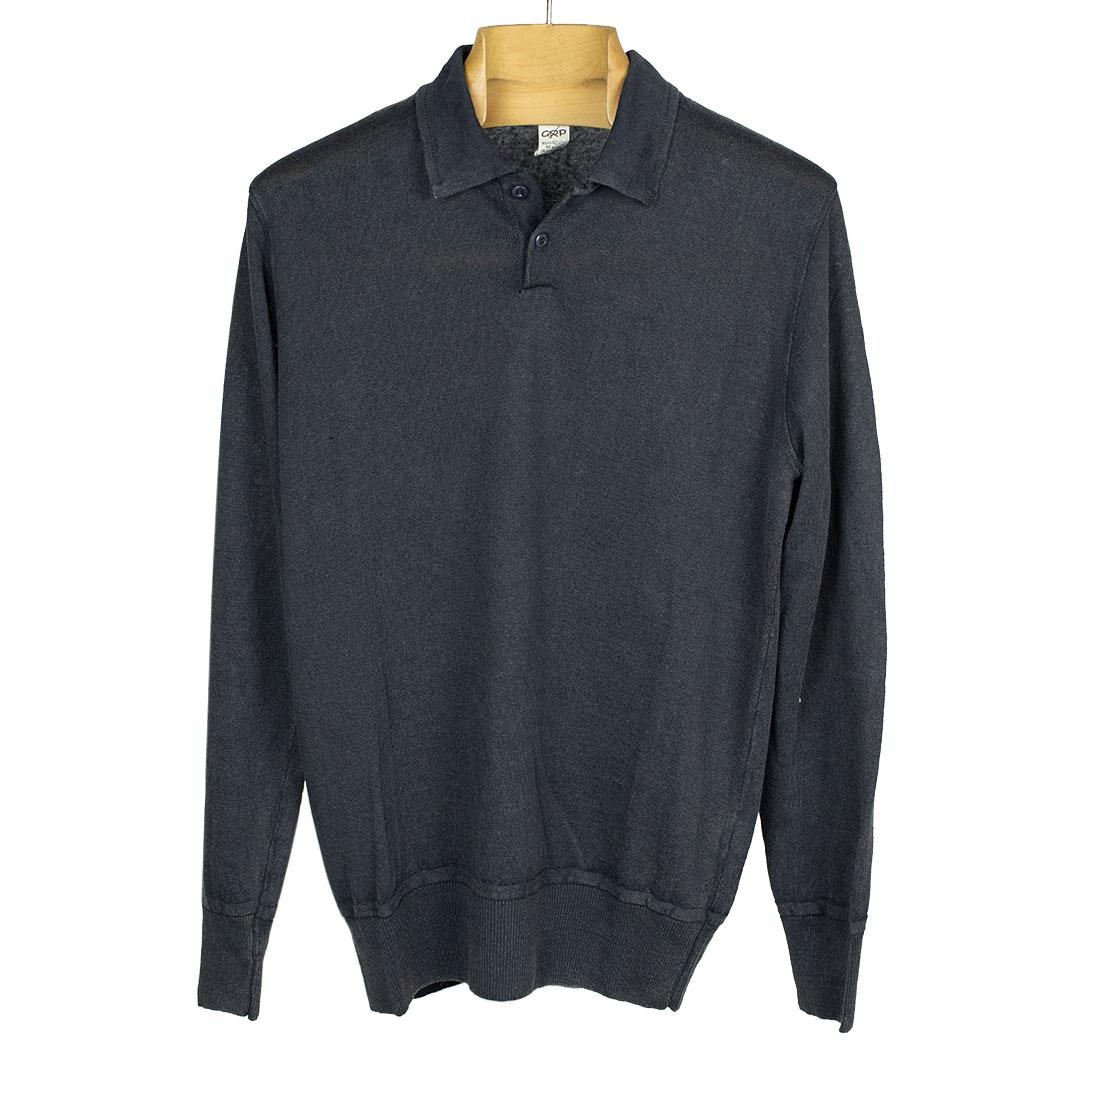 GRP Italy Spring Summer 2021 SS21 knit linen long sleeve polo (6).jpg